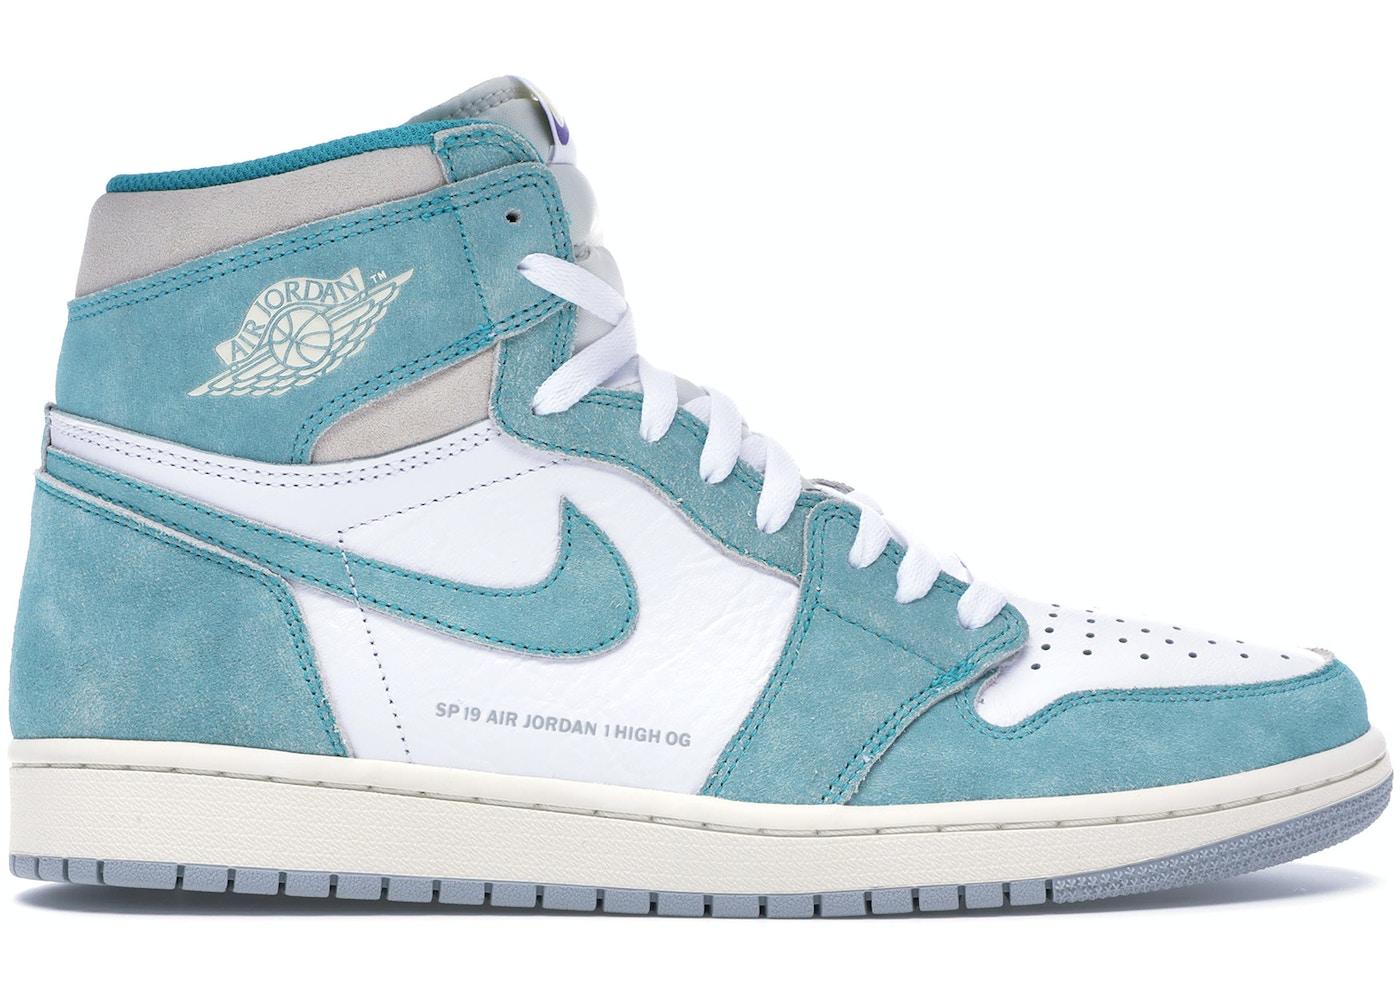 quality design 80618 fe213 Buy Air Jordan Shoes   Deadstock Sneakers